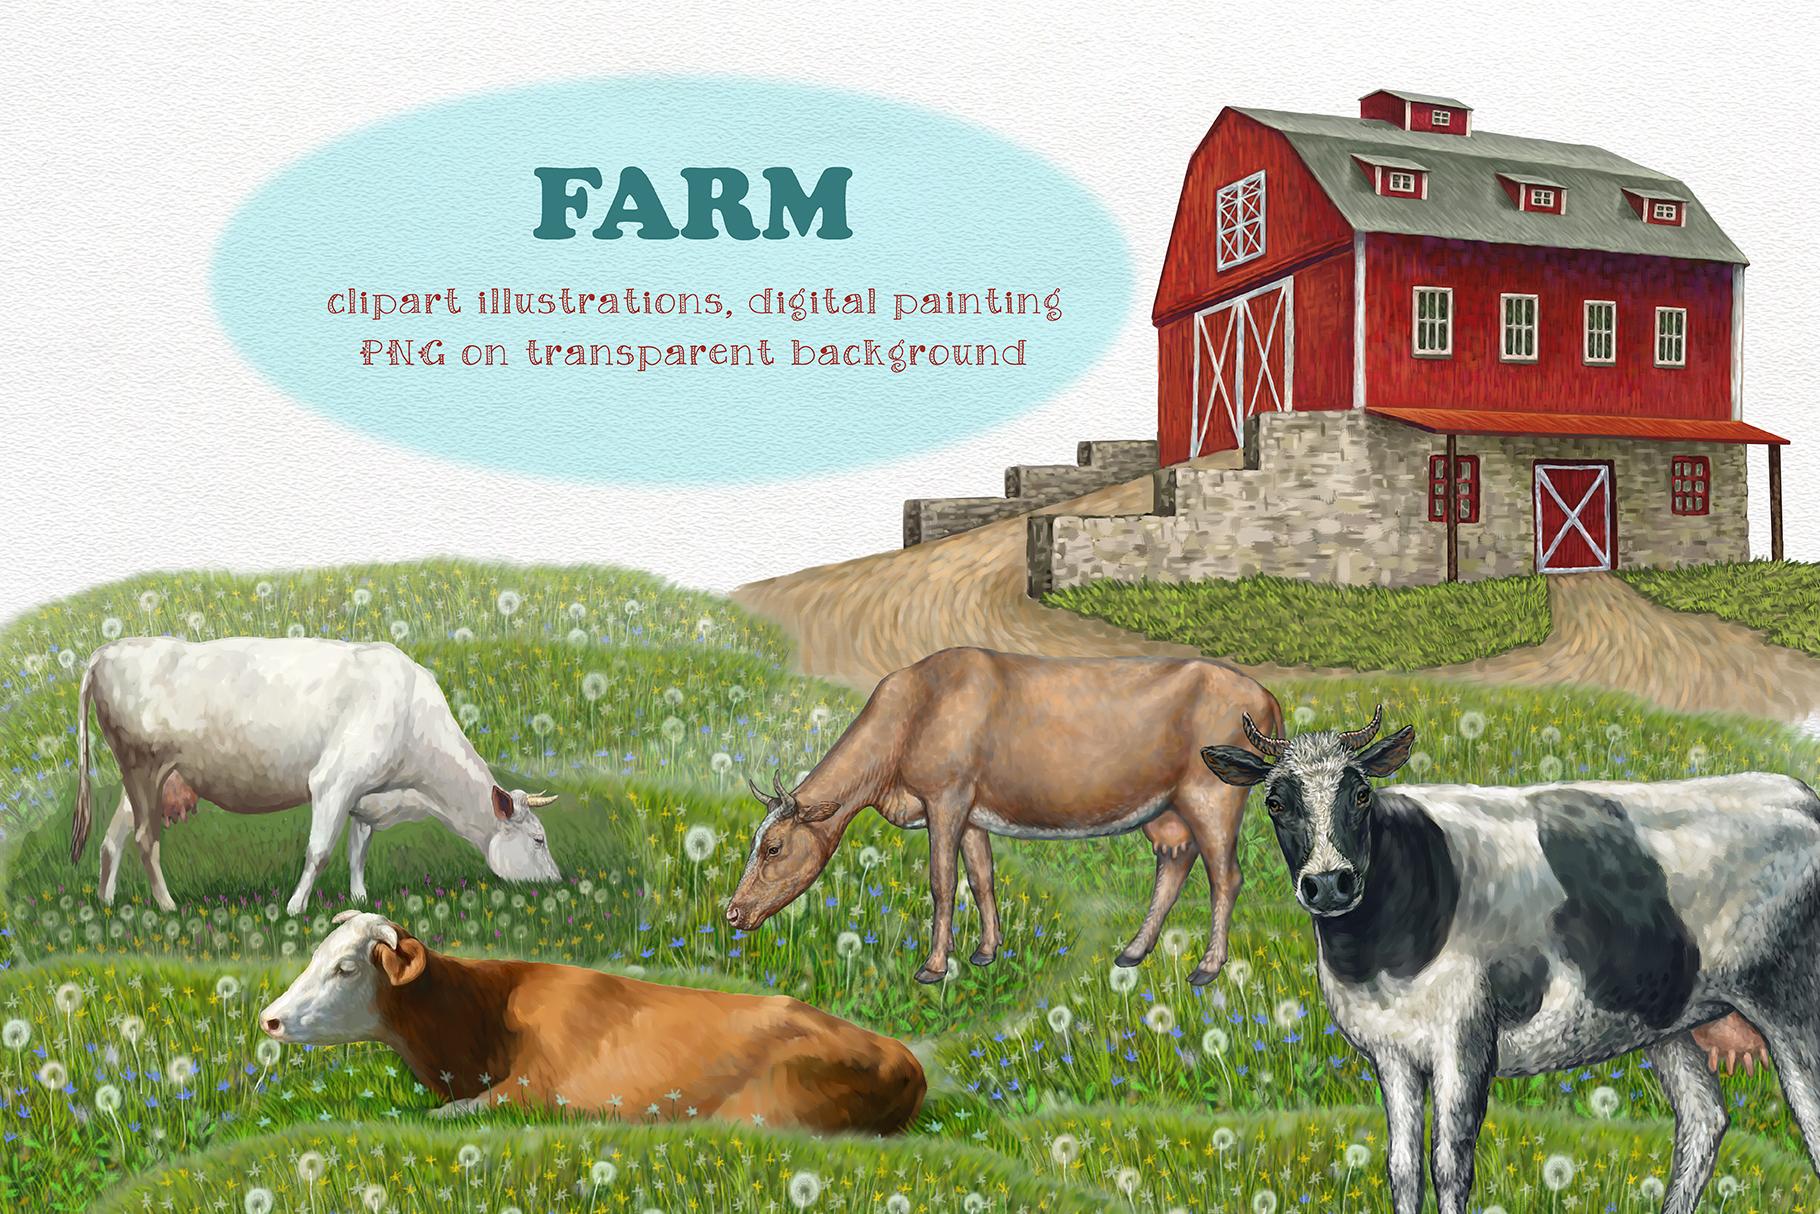 Farm. Cows clipart, Illustrations.